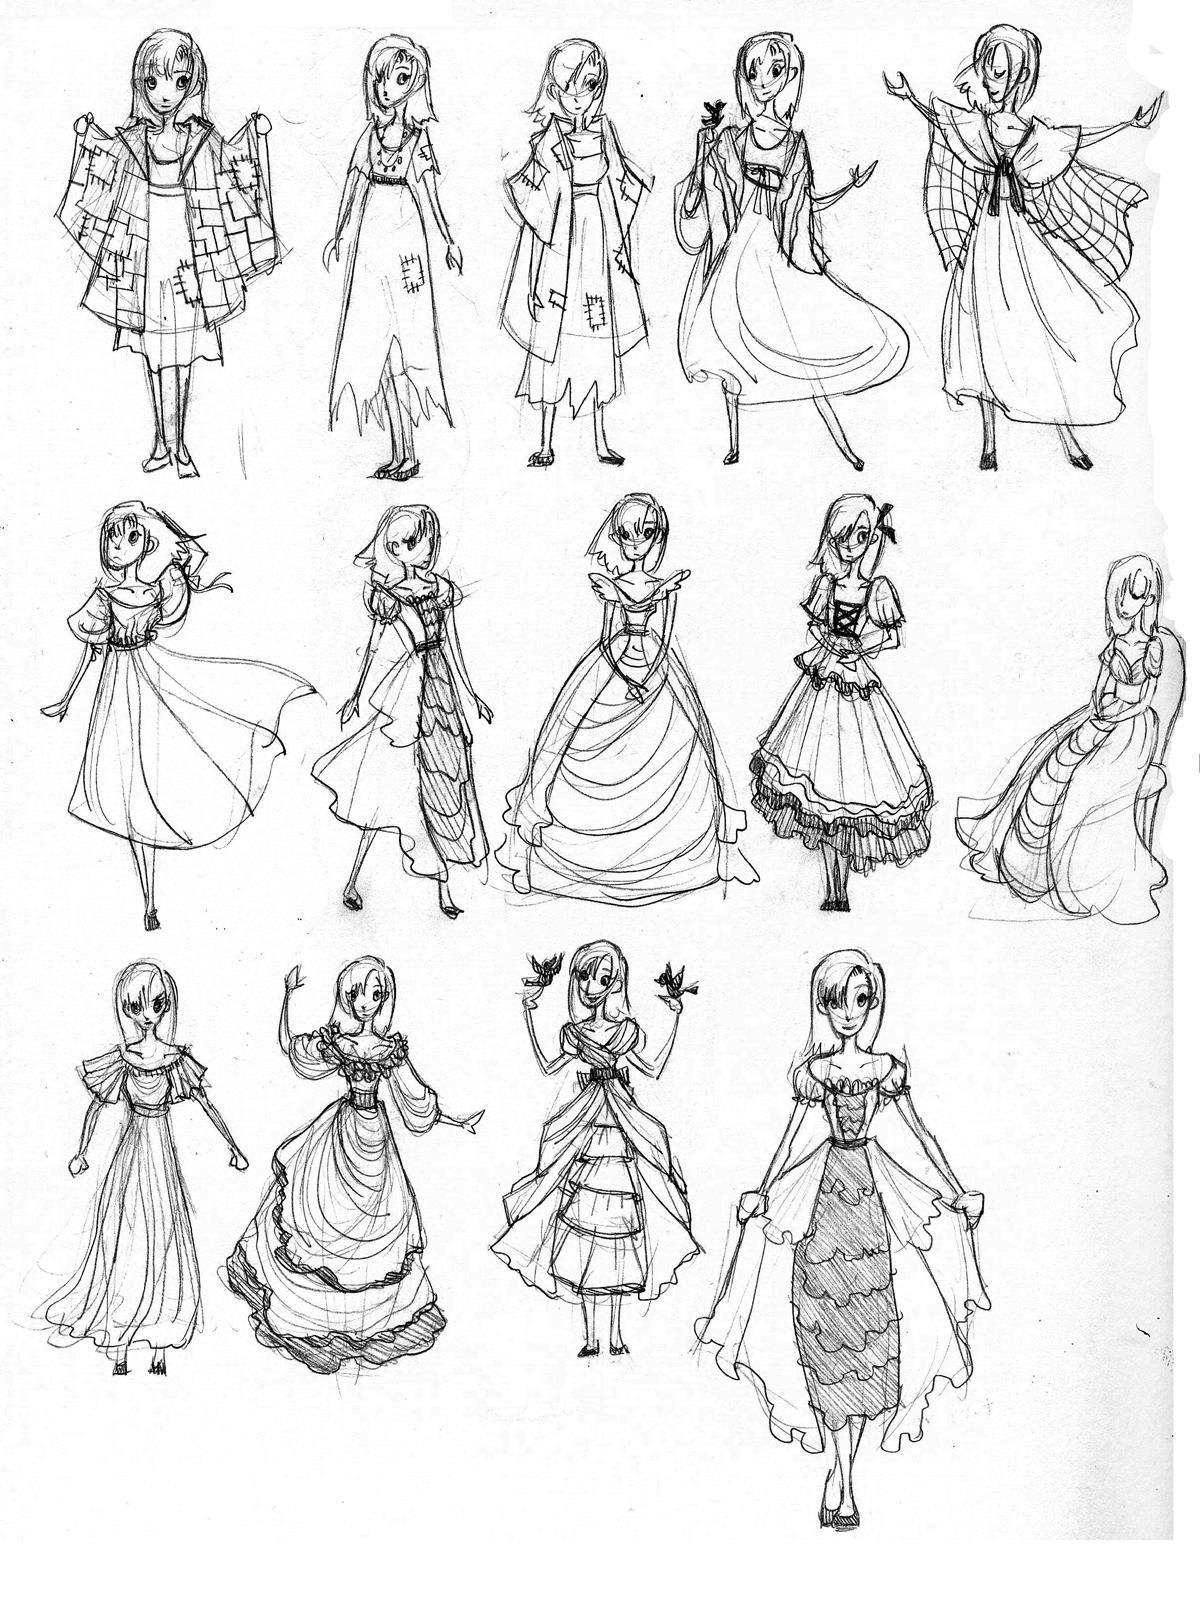 Anime Dresses Drawing 056b3fe20b8db89e1fba4138dff7d1